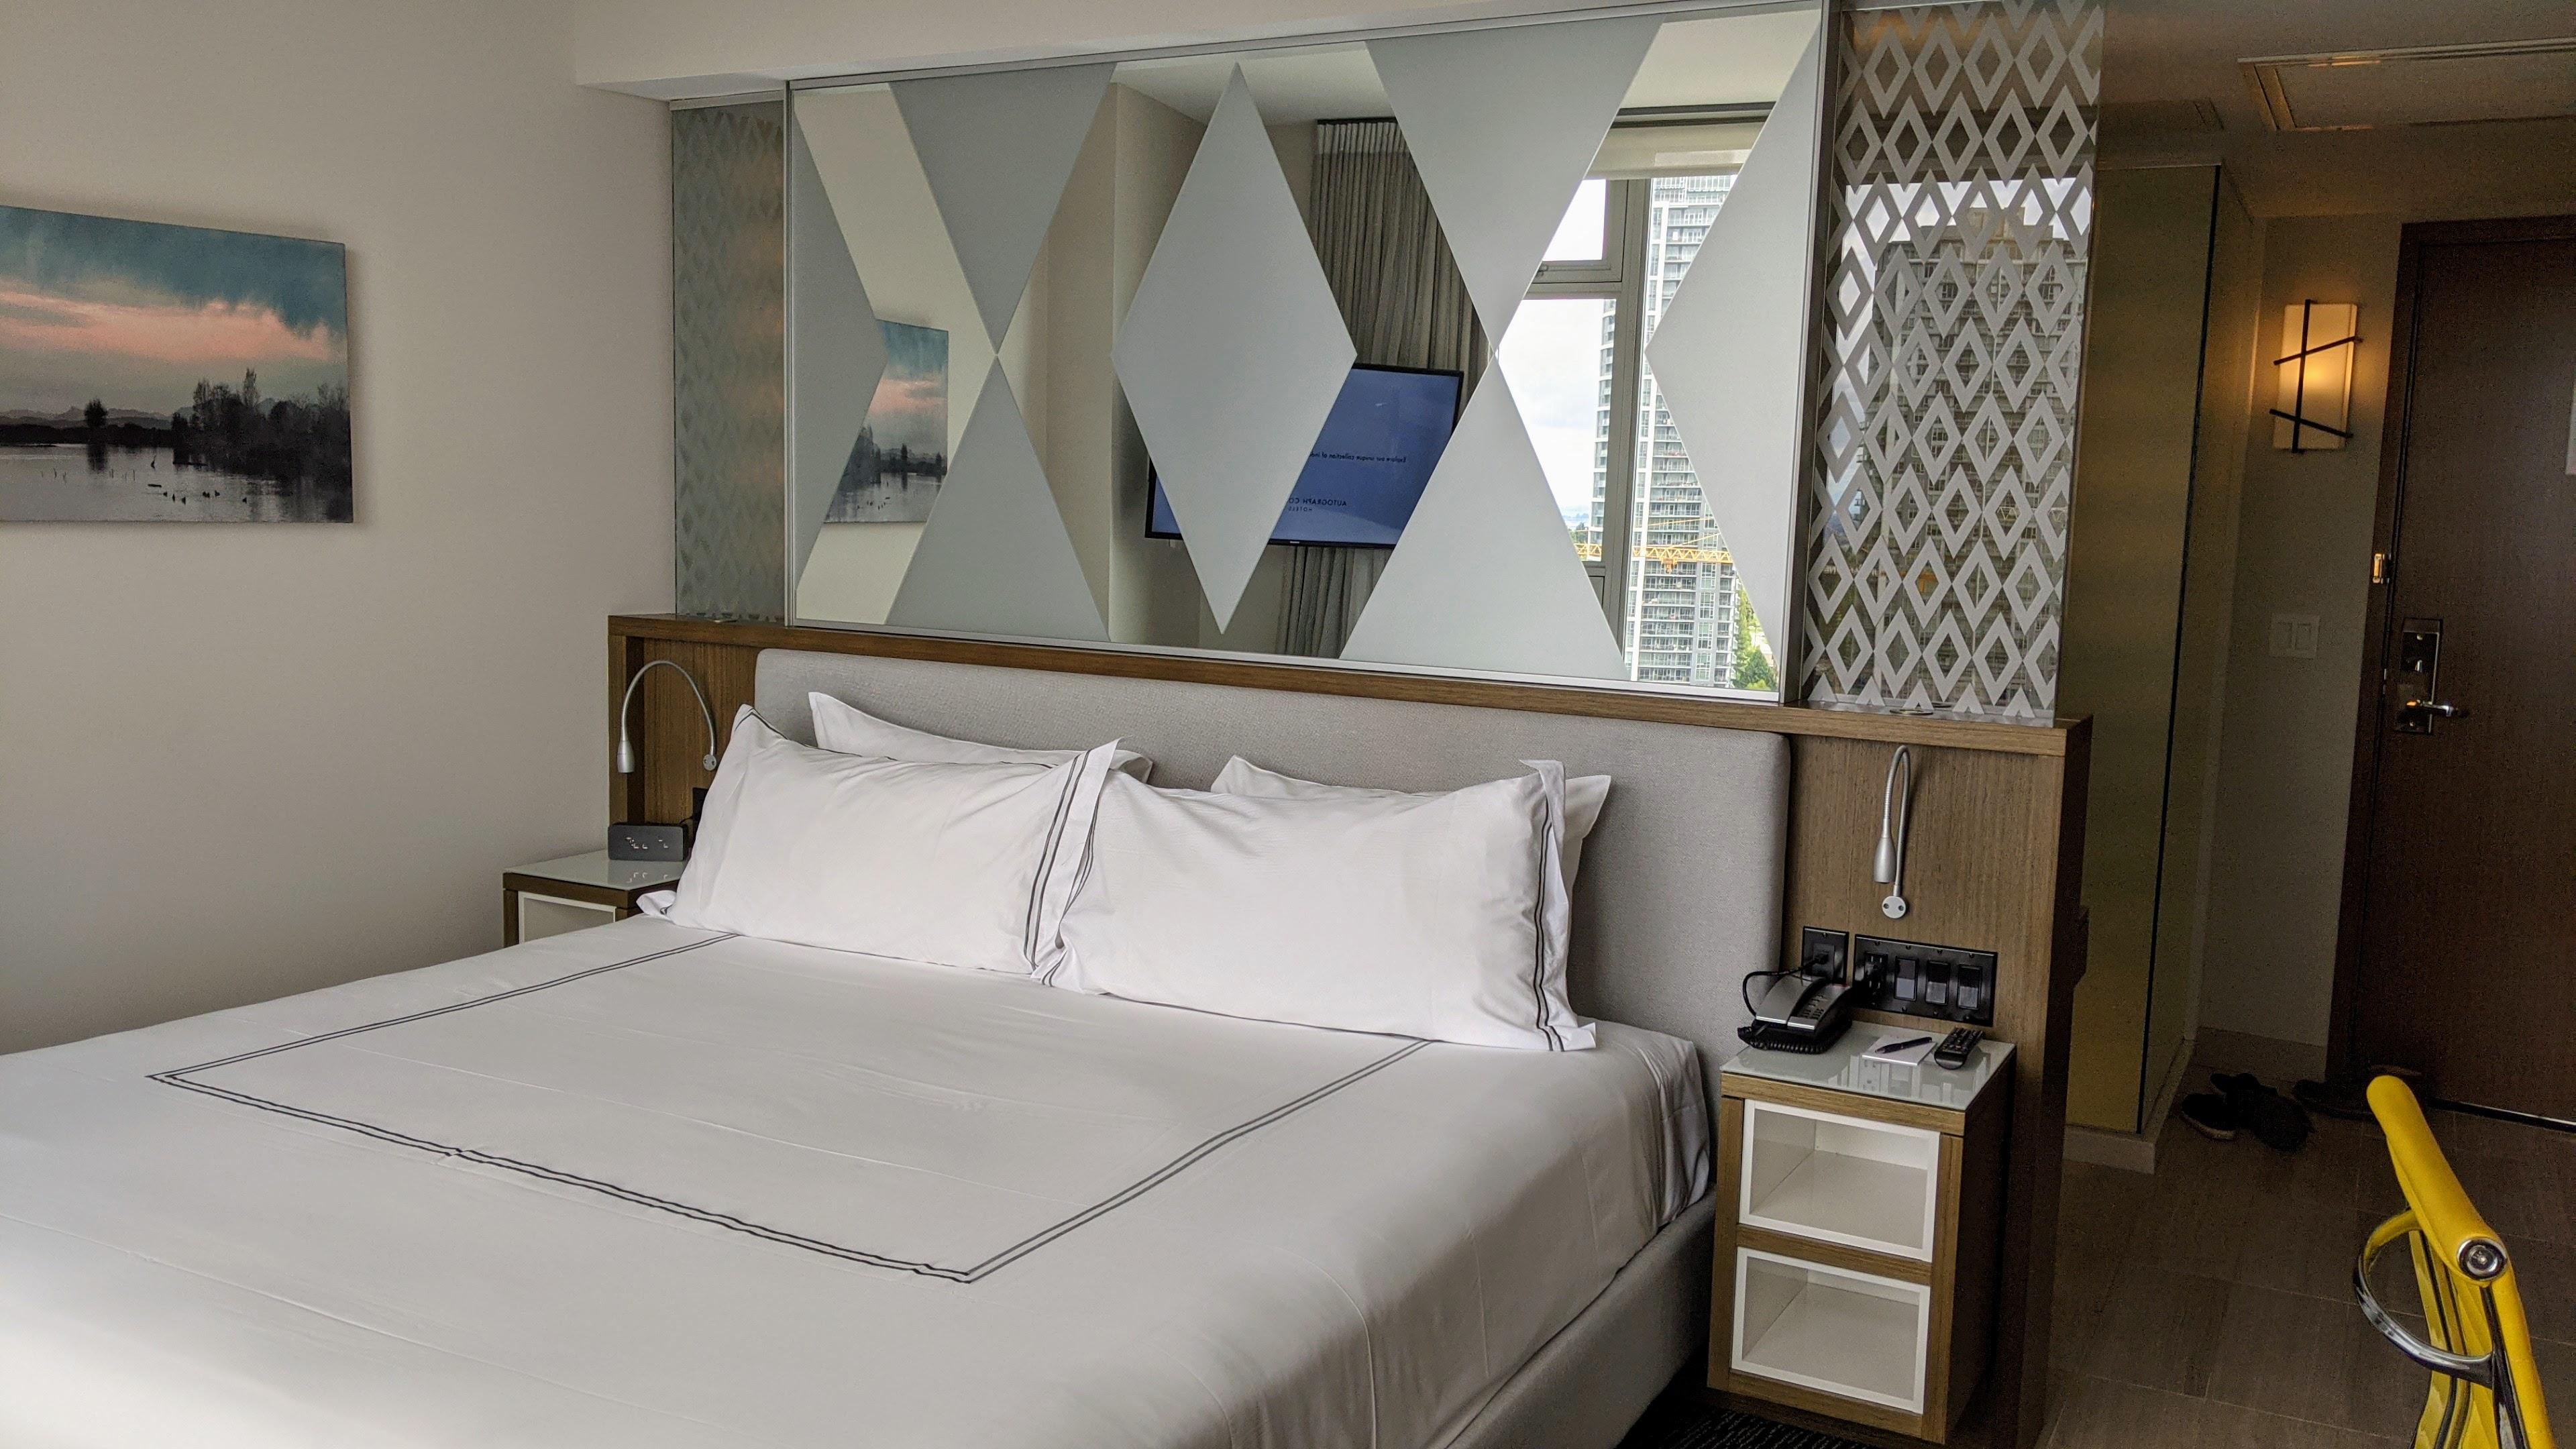 Civic Hotel - Civic King Room